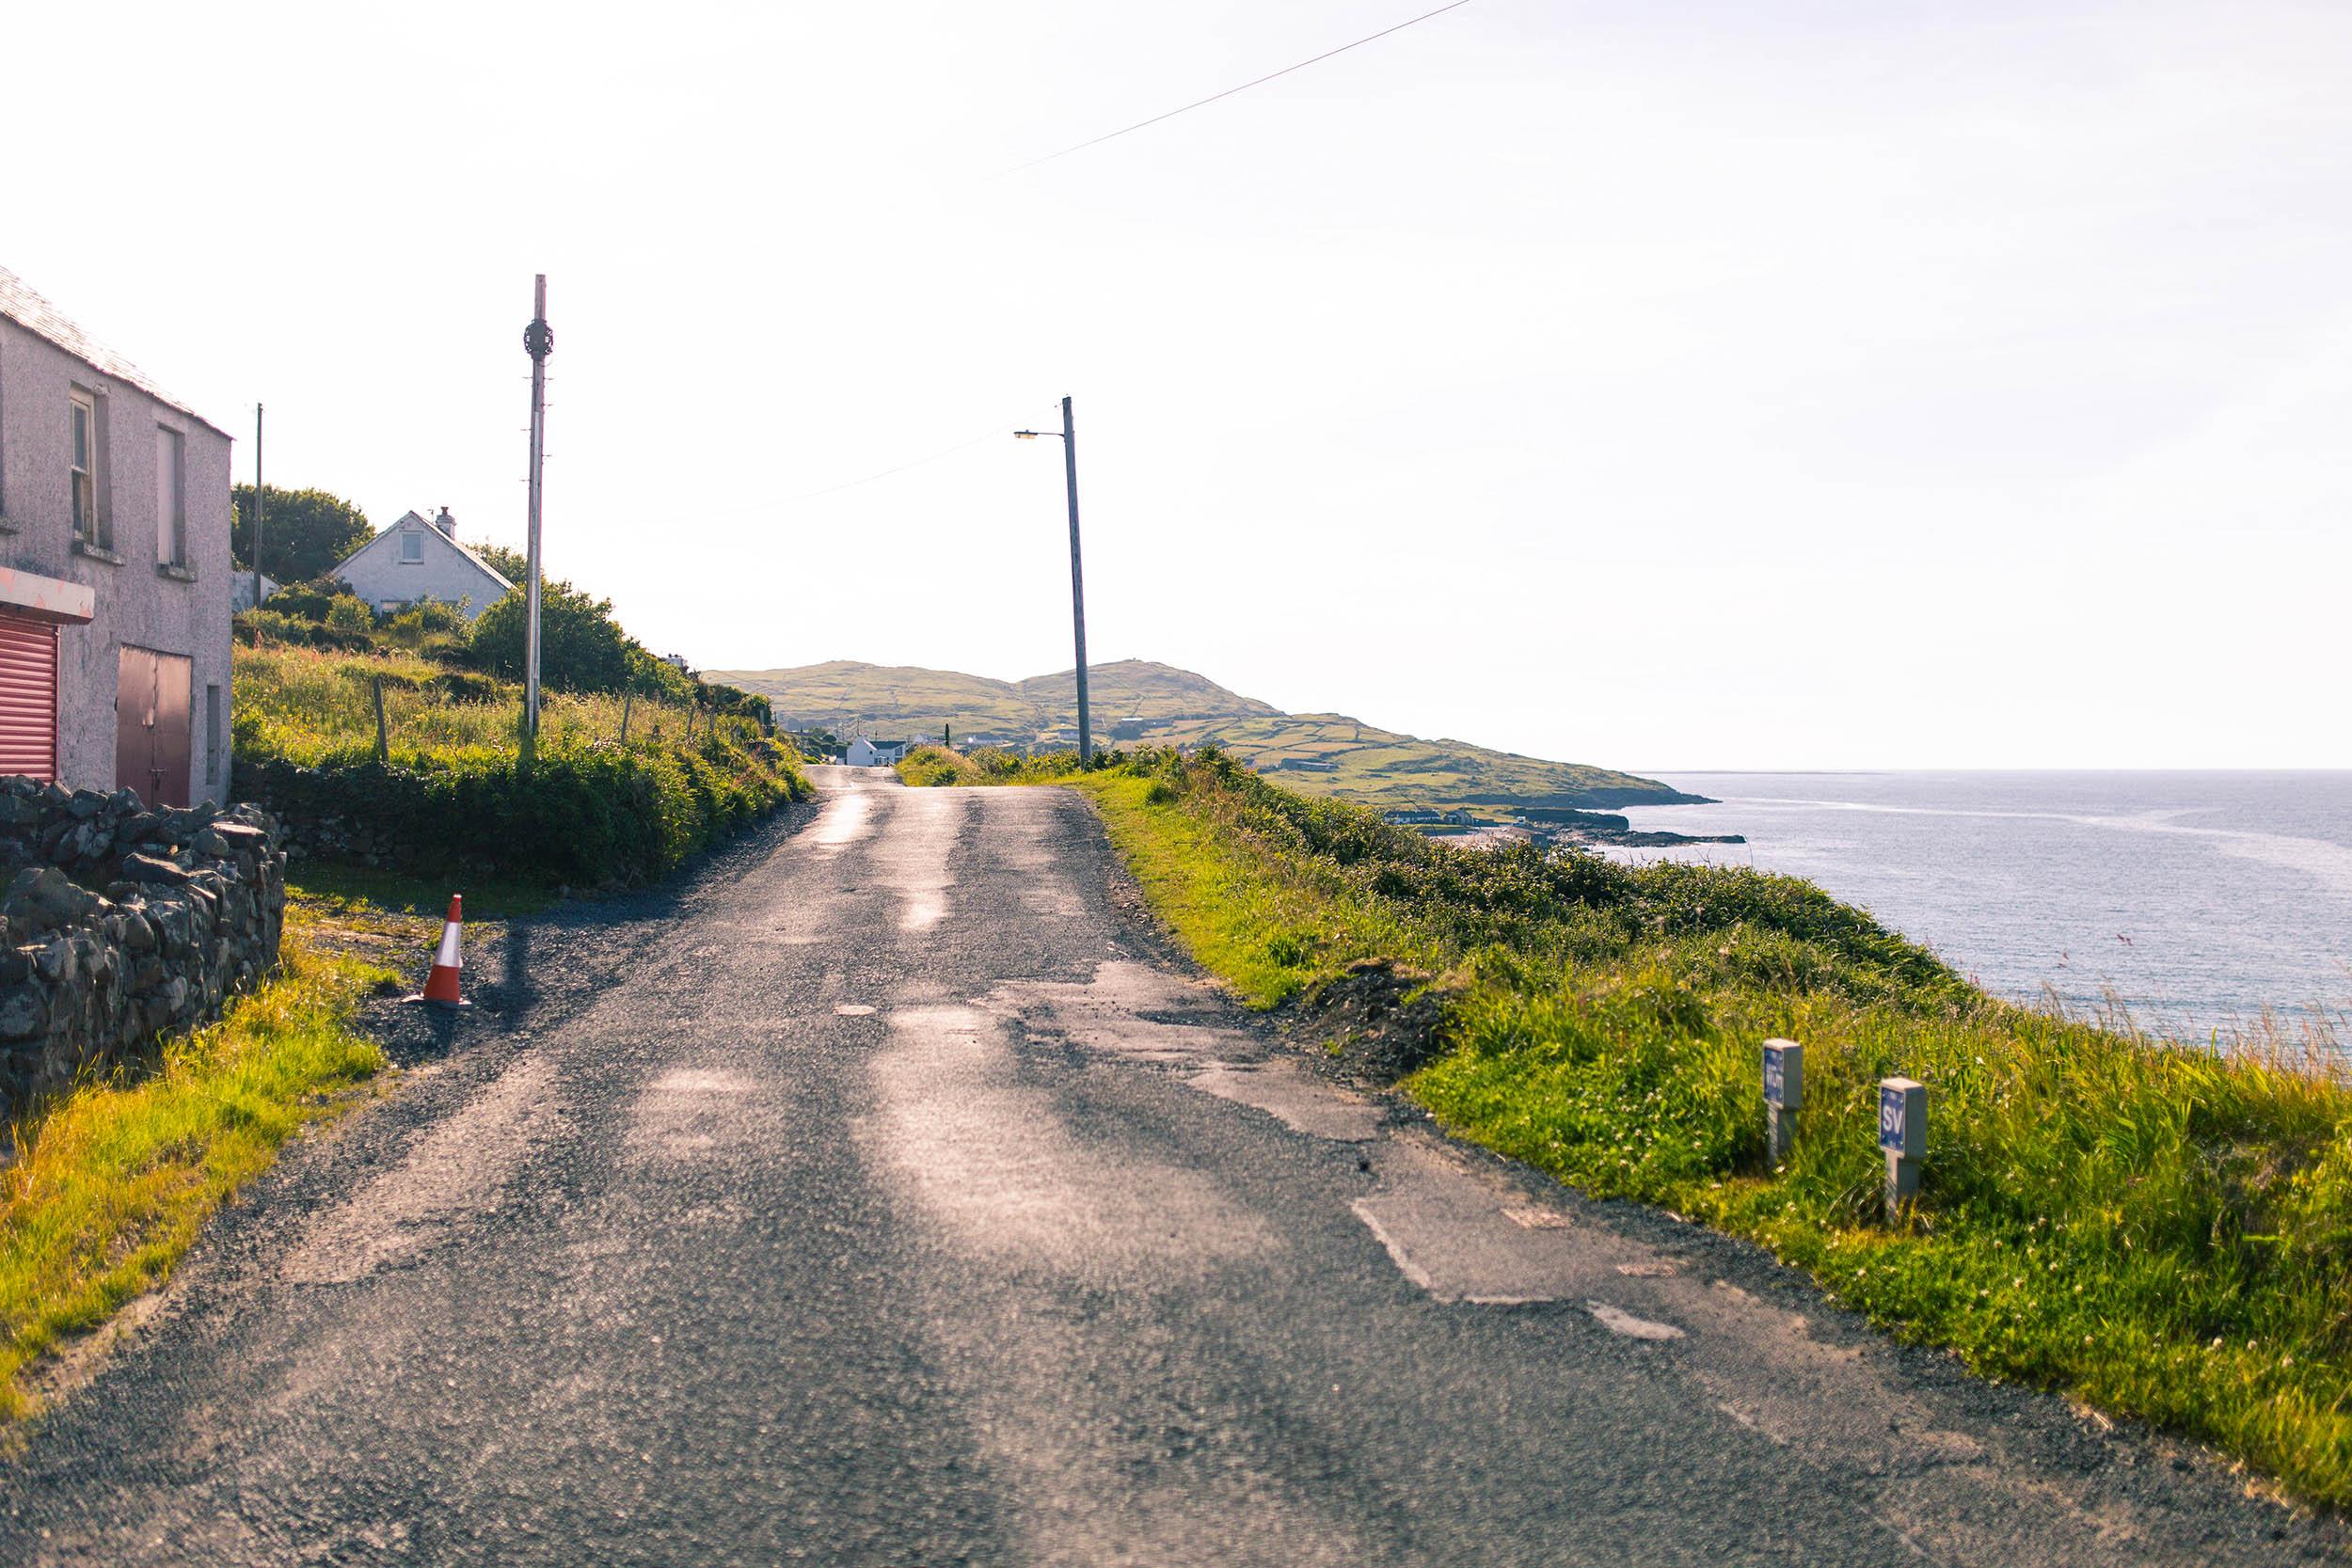 IRELAND_DONEGAL_PORTNOO_0049